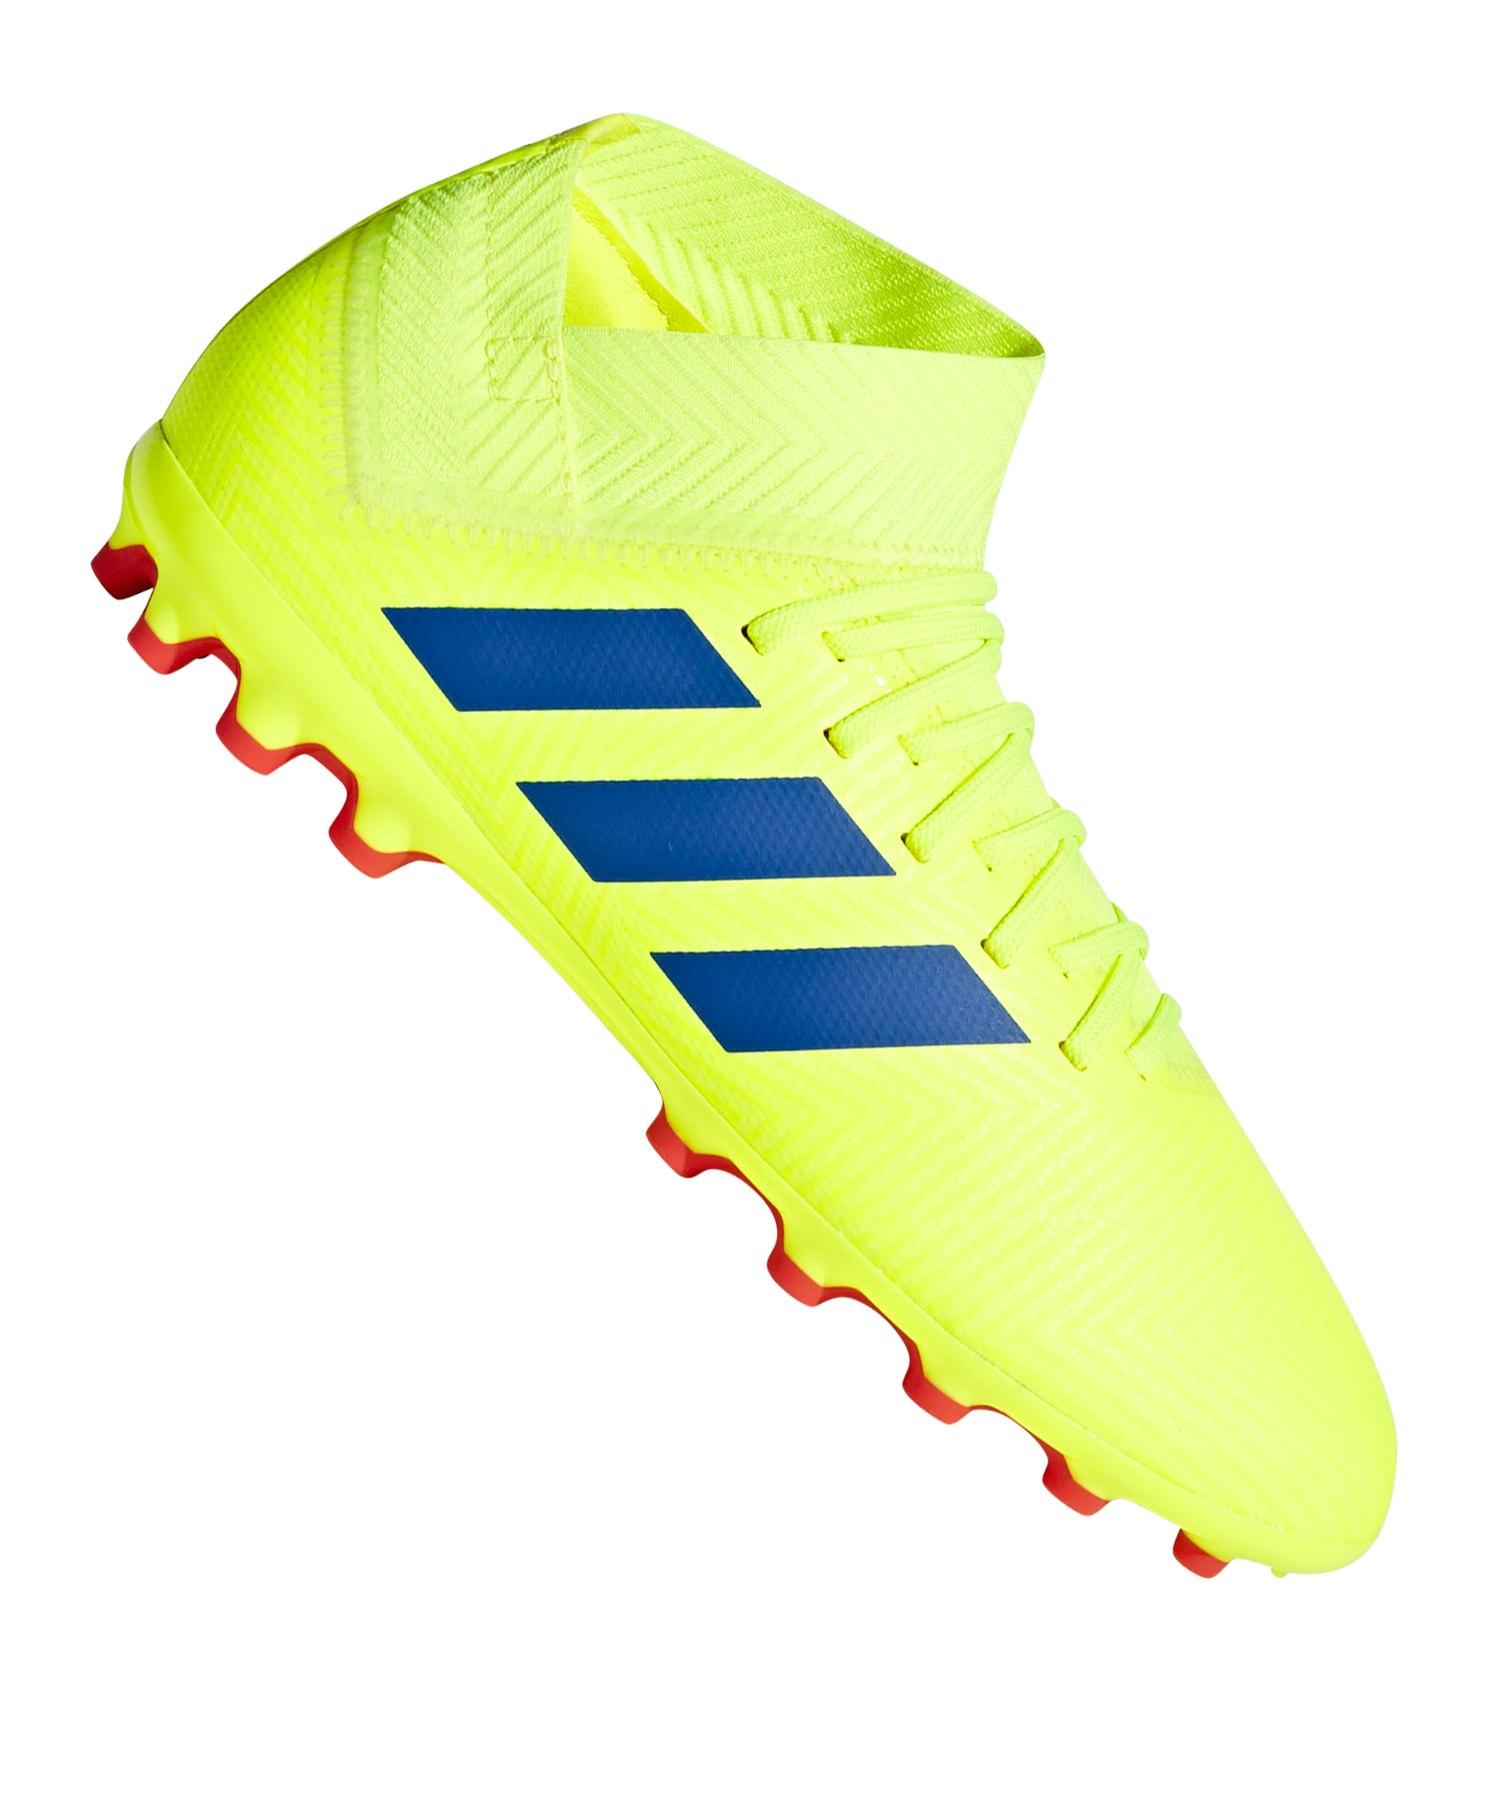 b77d742f9 adidas NEMEZIZ 18.3 AG J Kids Gelb Rot |Kinderfußballschuh ...